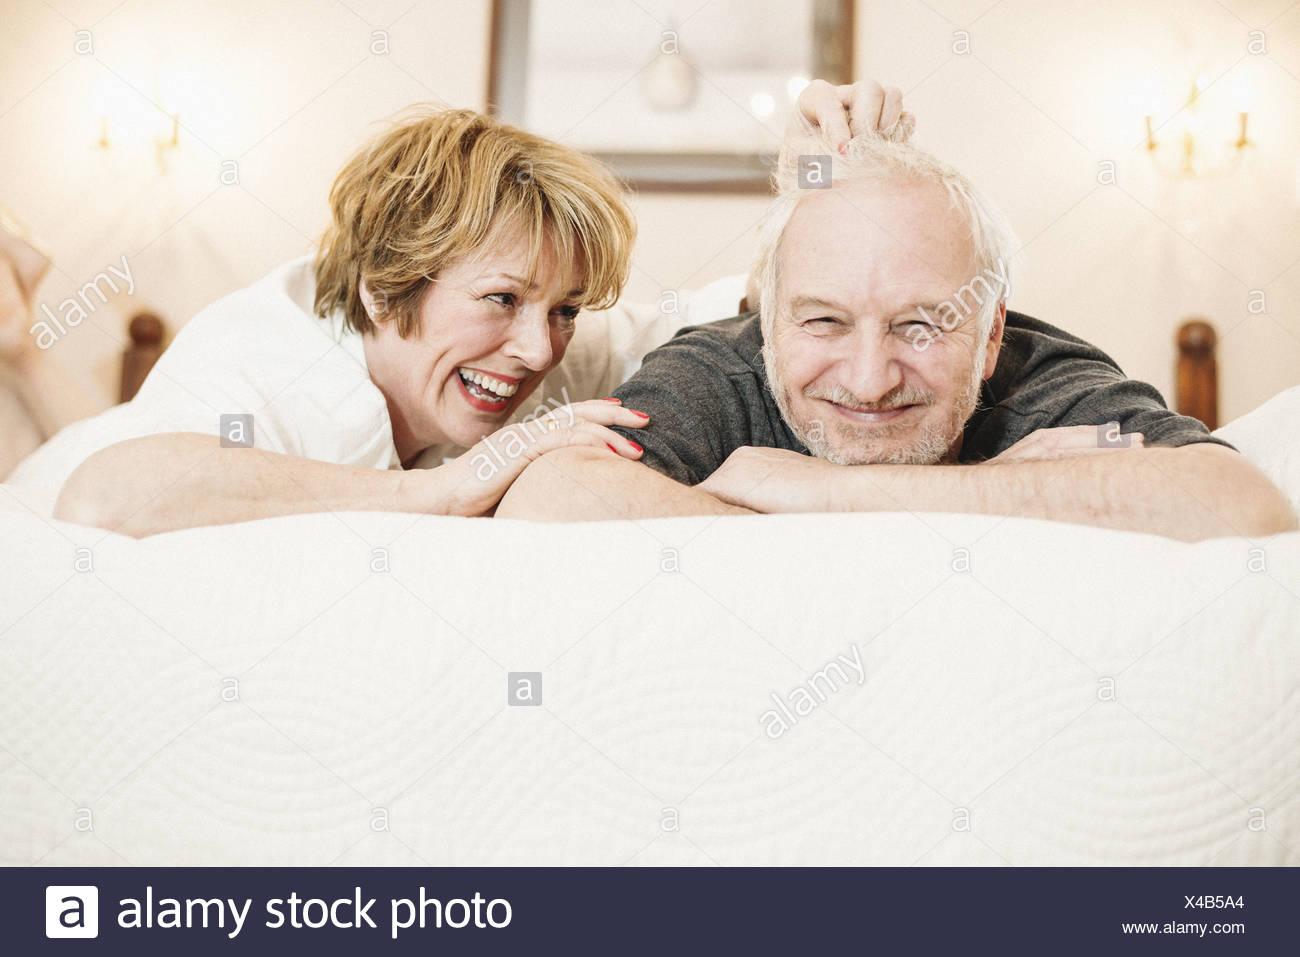 Couple lying on bed, portrait - Stock Image